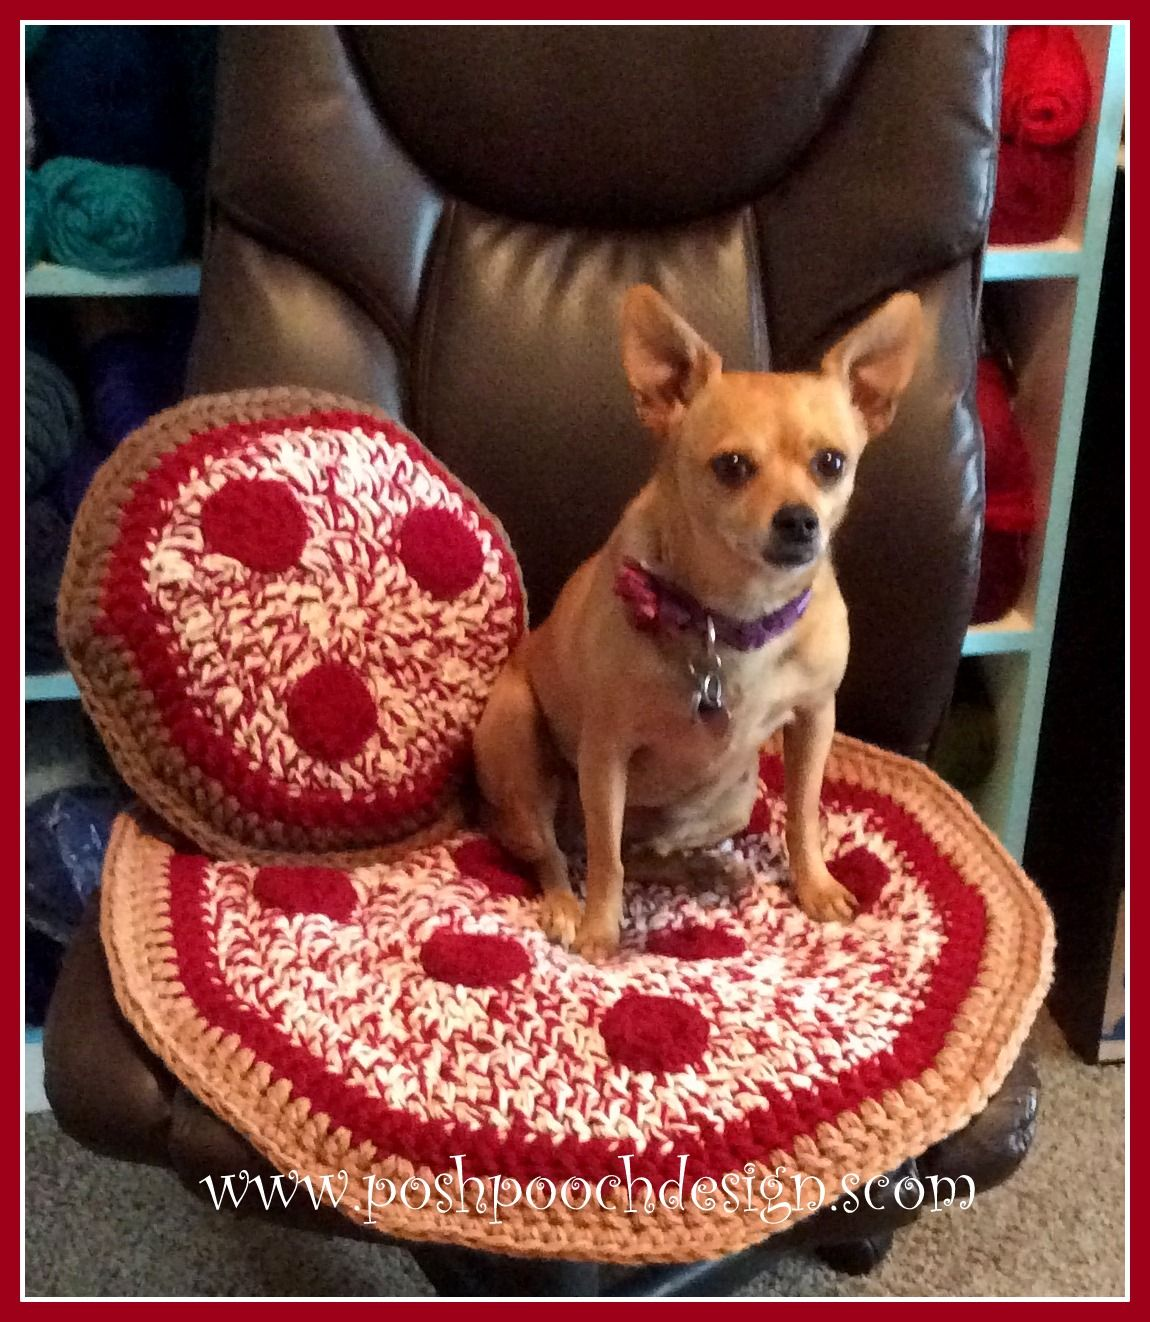 Posh Pooch Designs Dog Clothes: Pizza Pillow Crochet Pattern   Posh ...